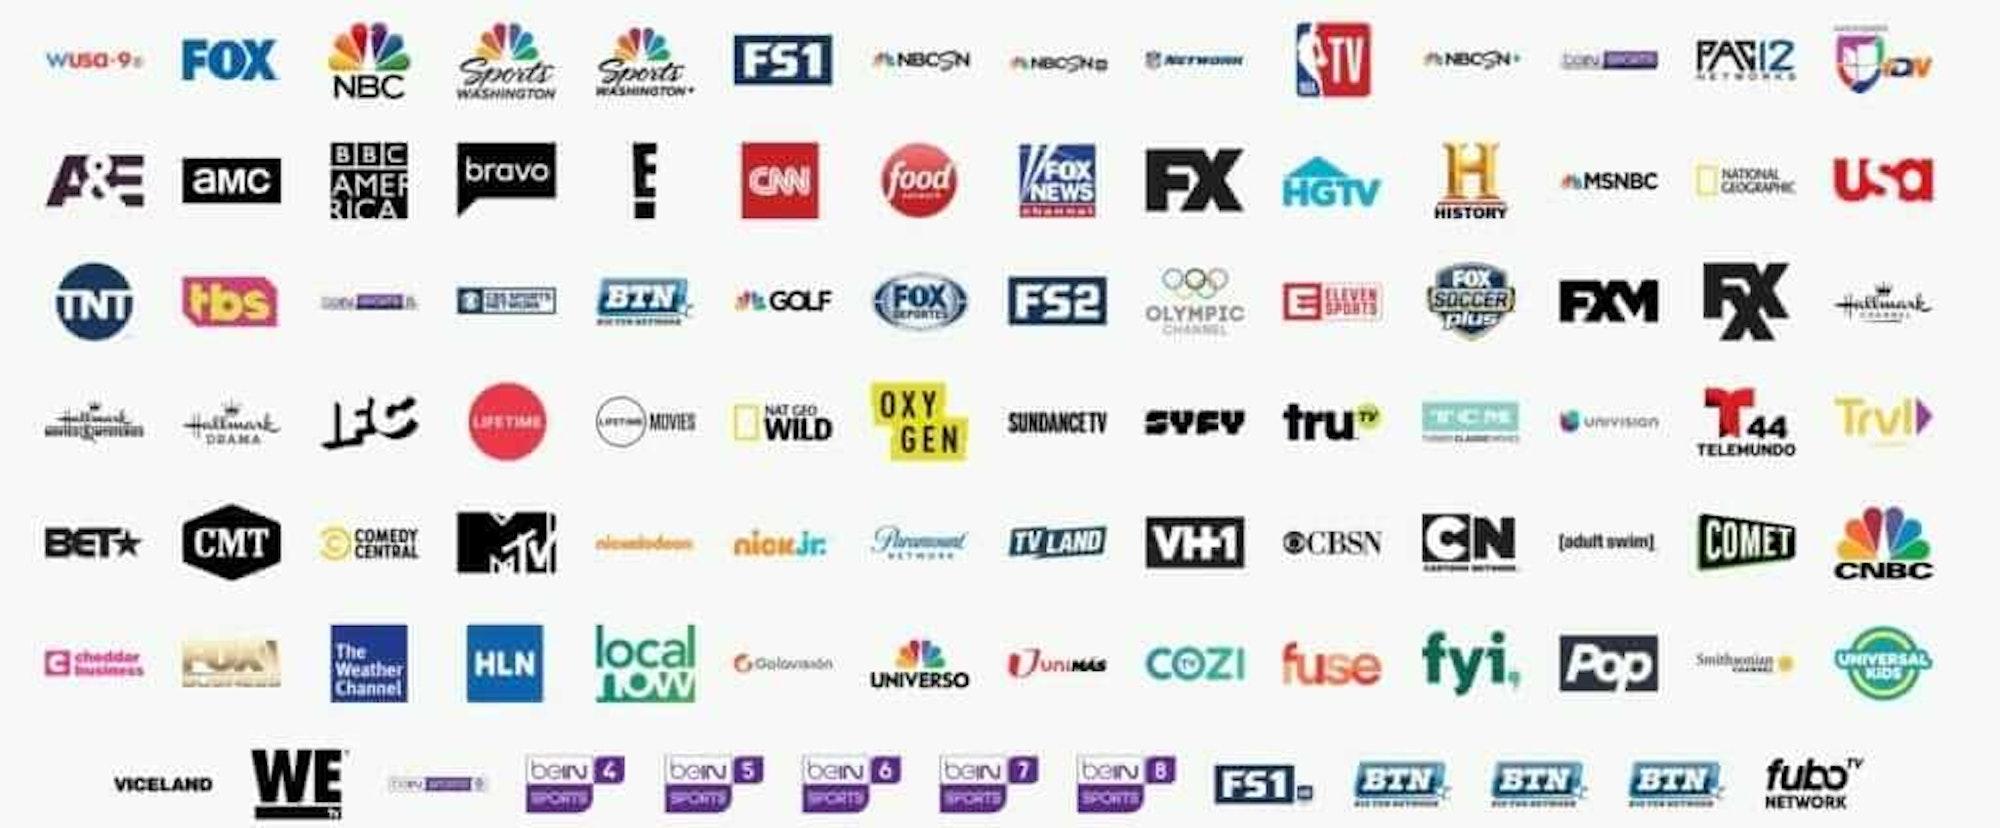 cowboys eagles fubo tv streaming nfl nfc